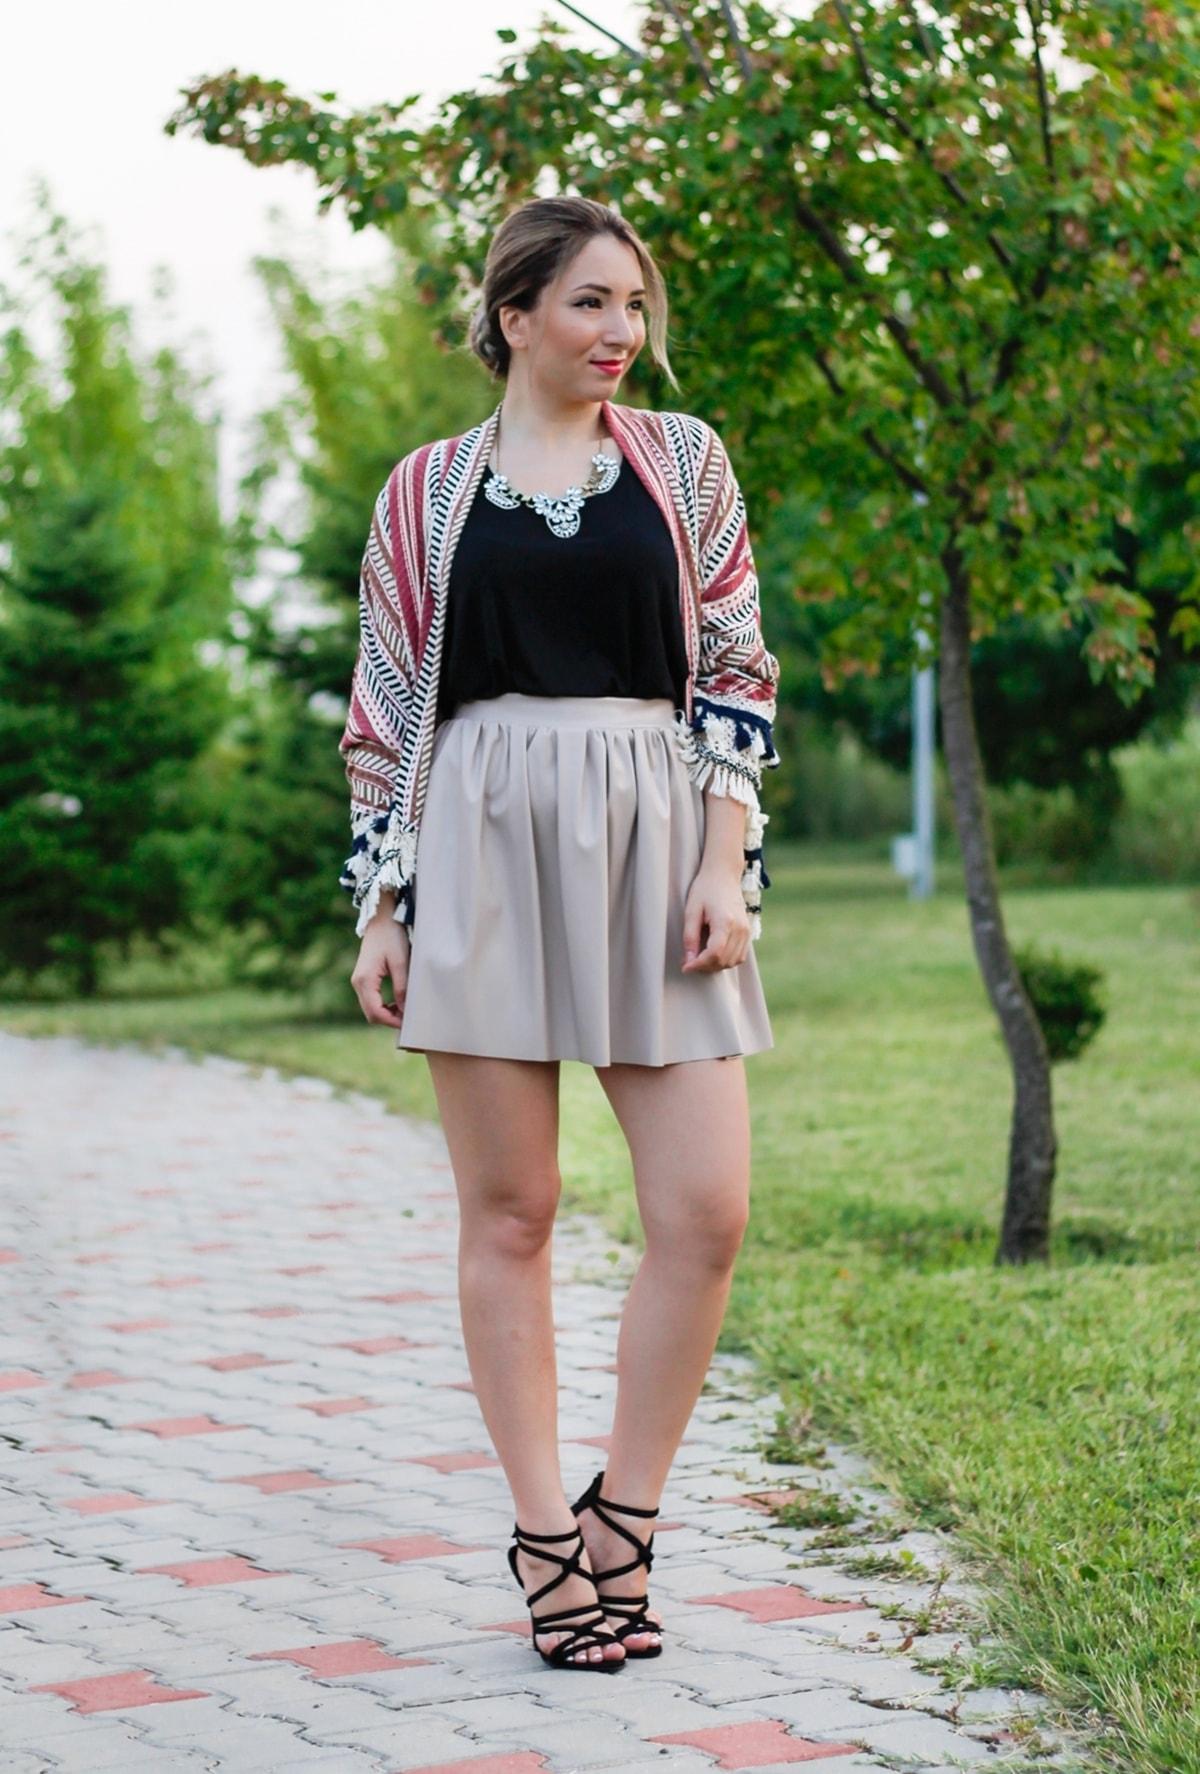 Tinuta de vara: fusta imitatie de piele, incretita, beige, top negru, kimono dungi si ciucuri, sandale cu nod zara, andreea ristea blogger moda